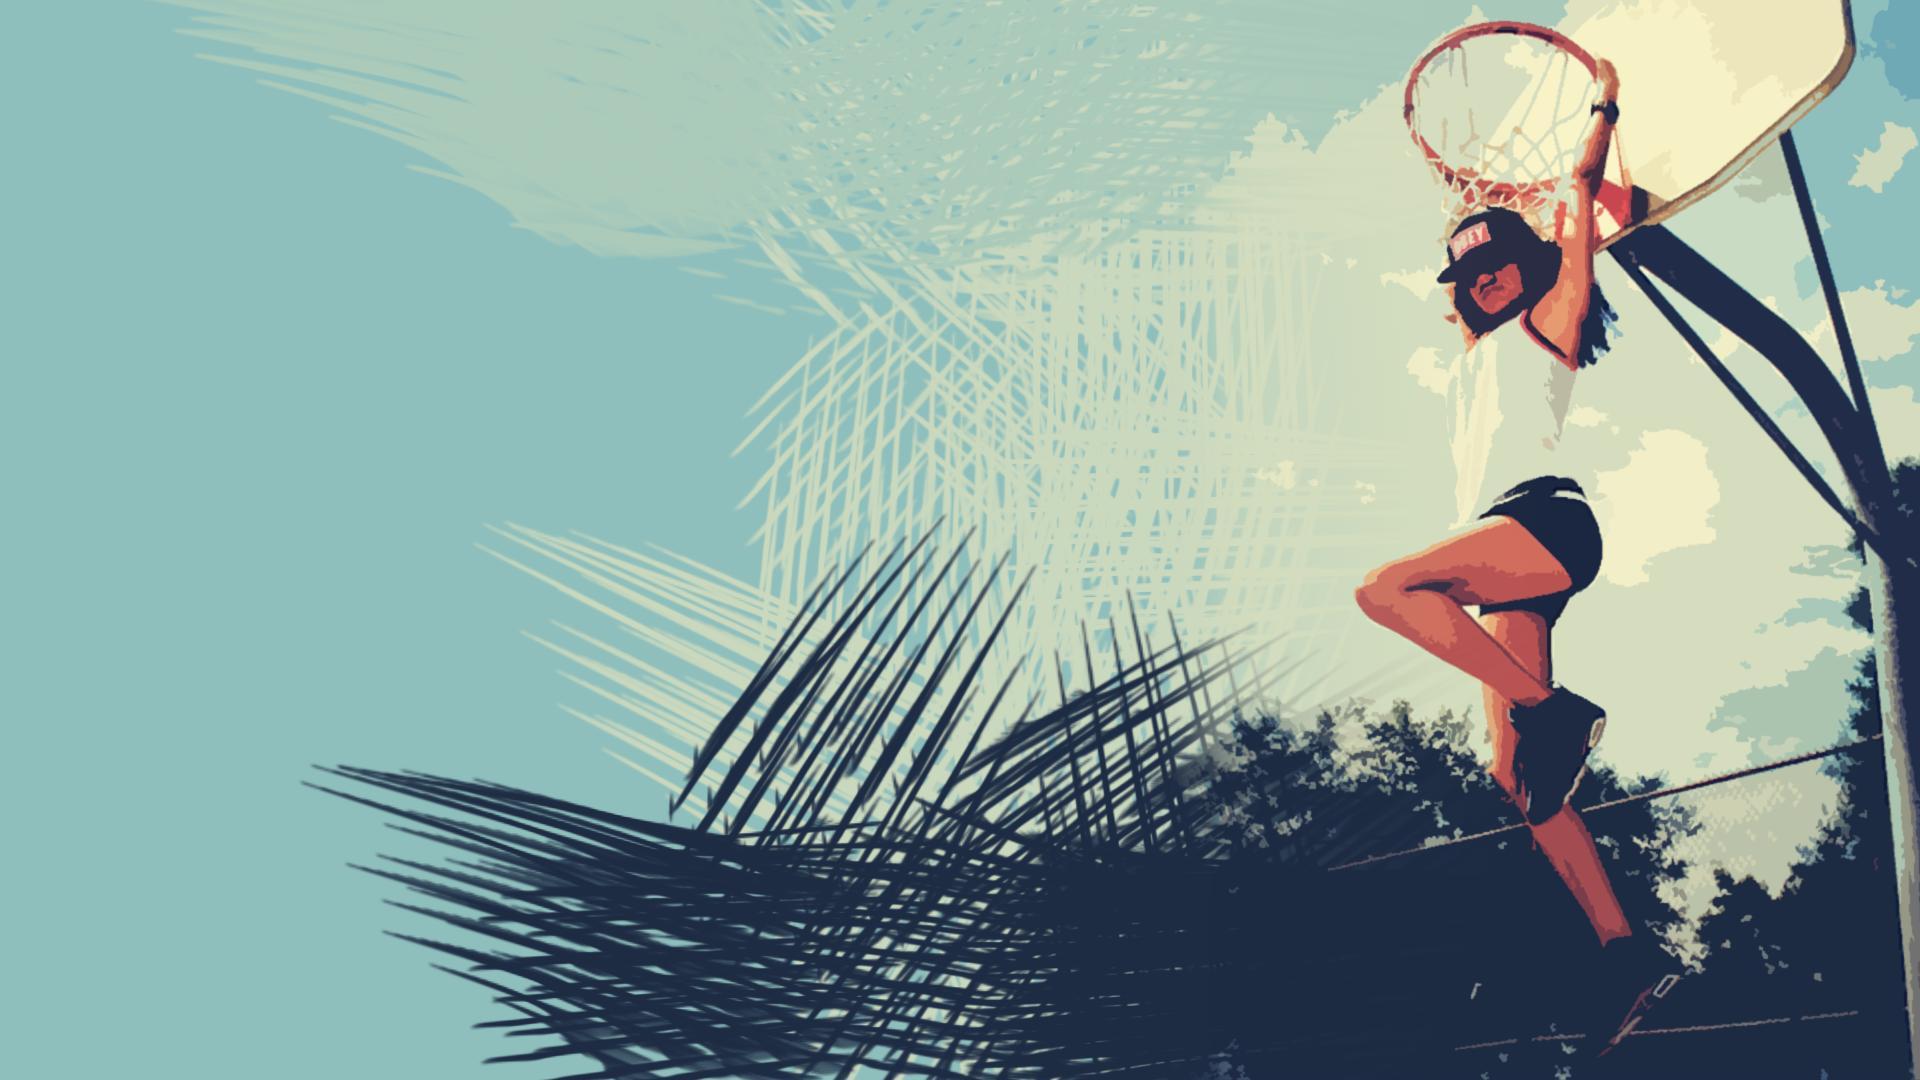 Basketball Woman Dunk Hd Wallpaper 64291 1920x1080px